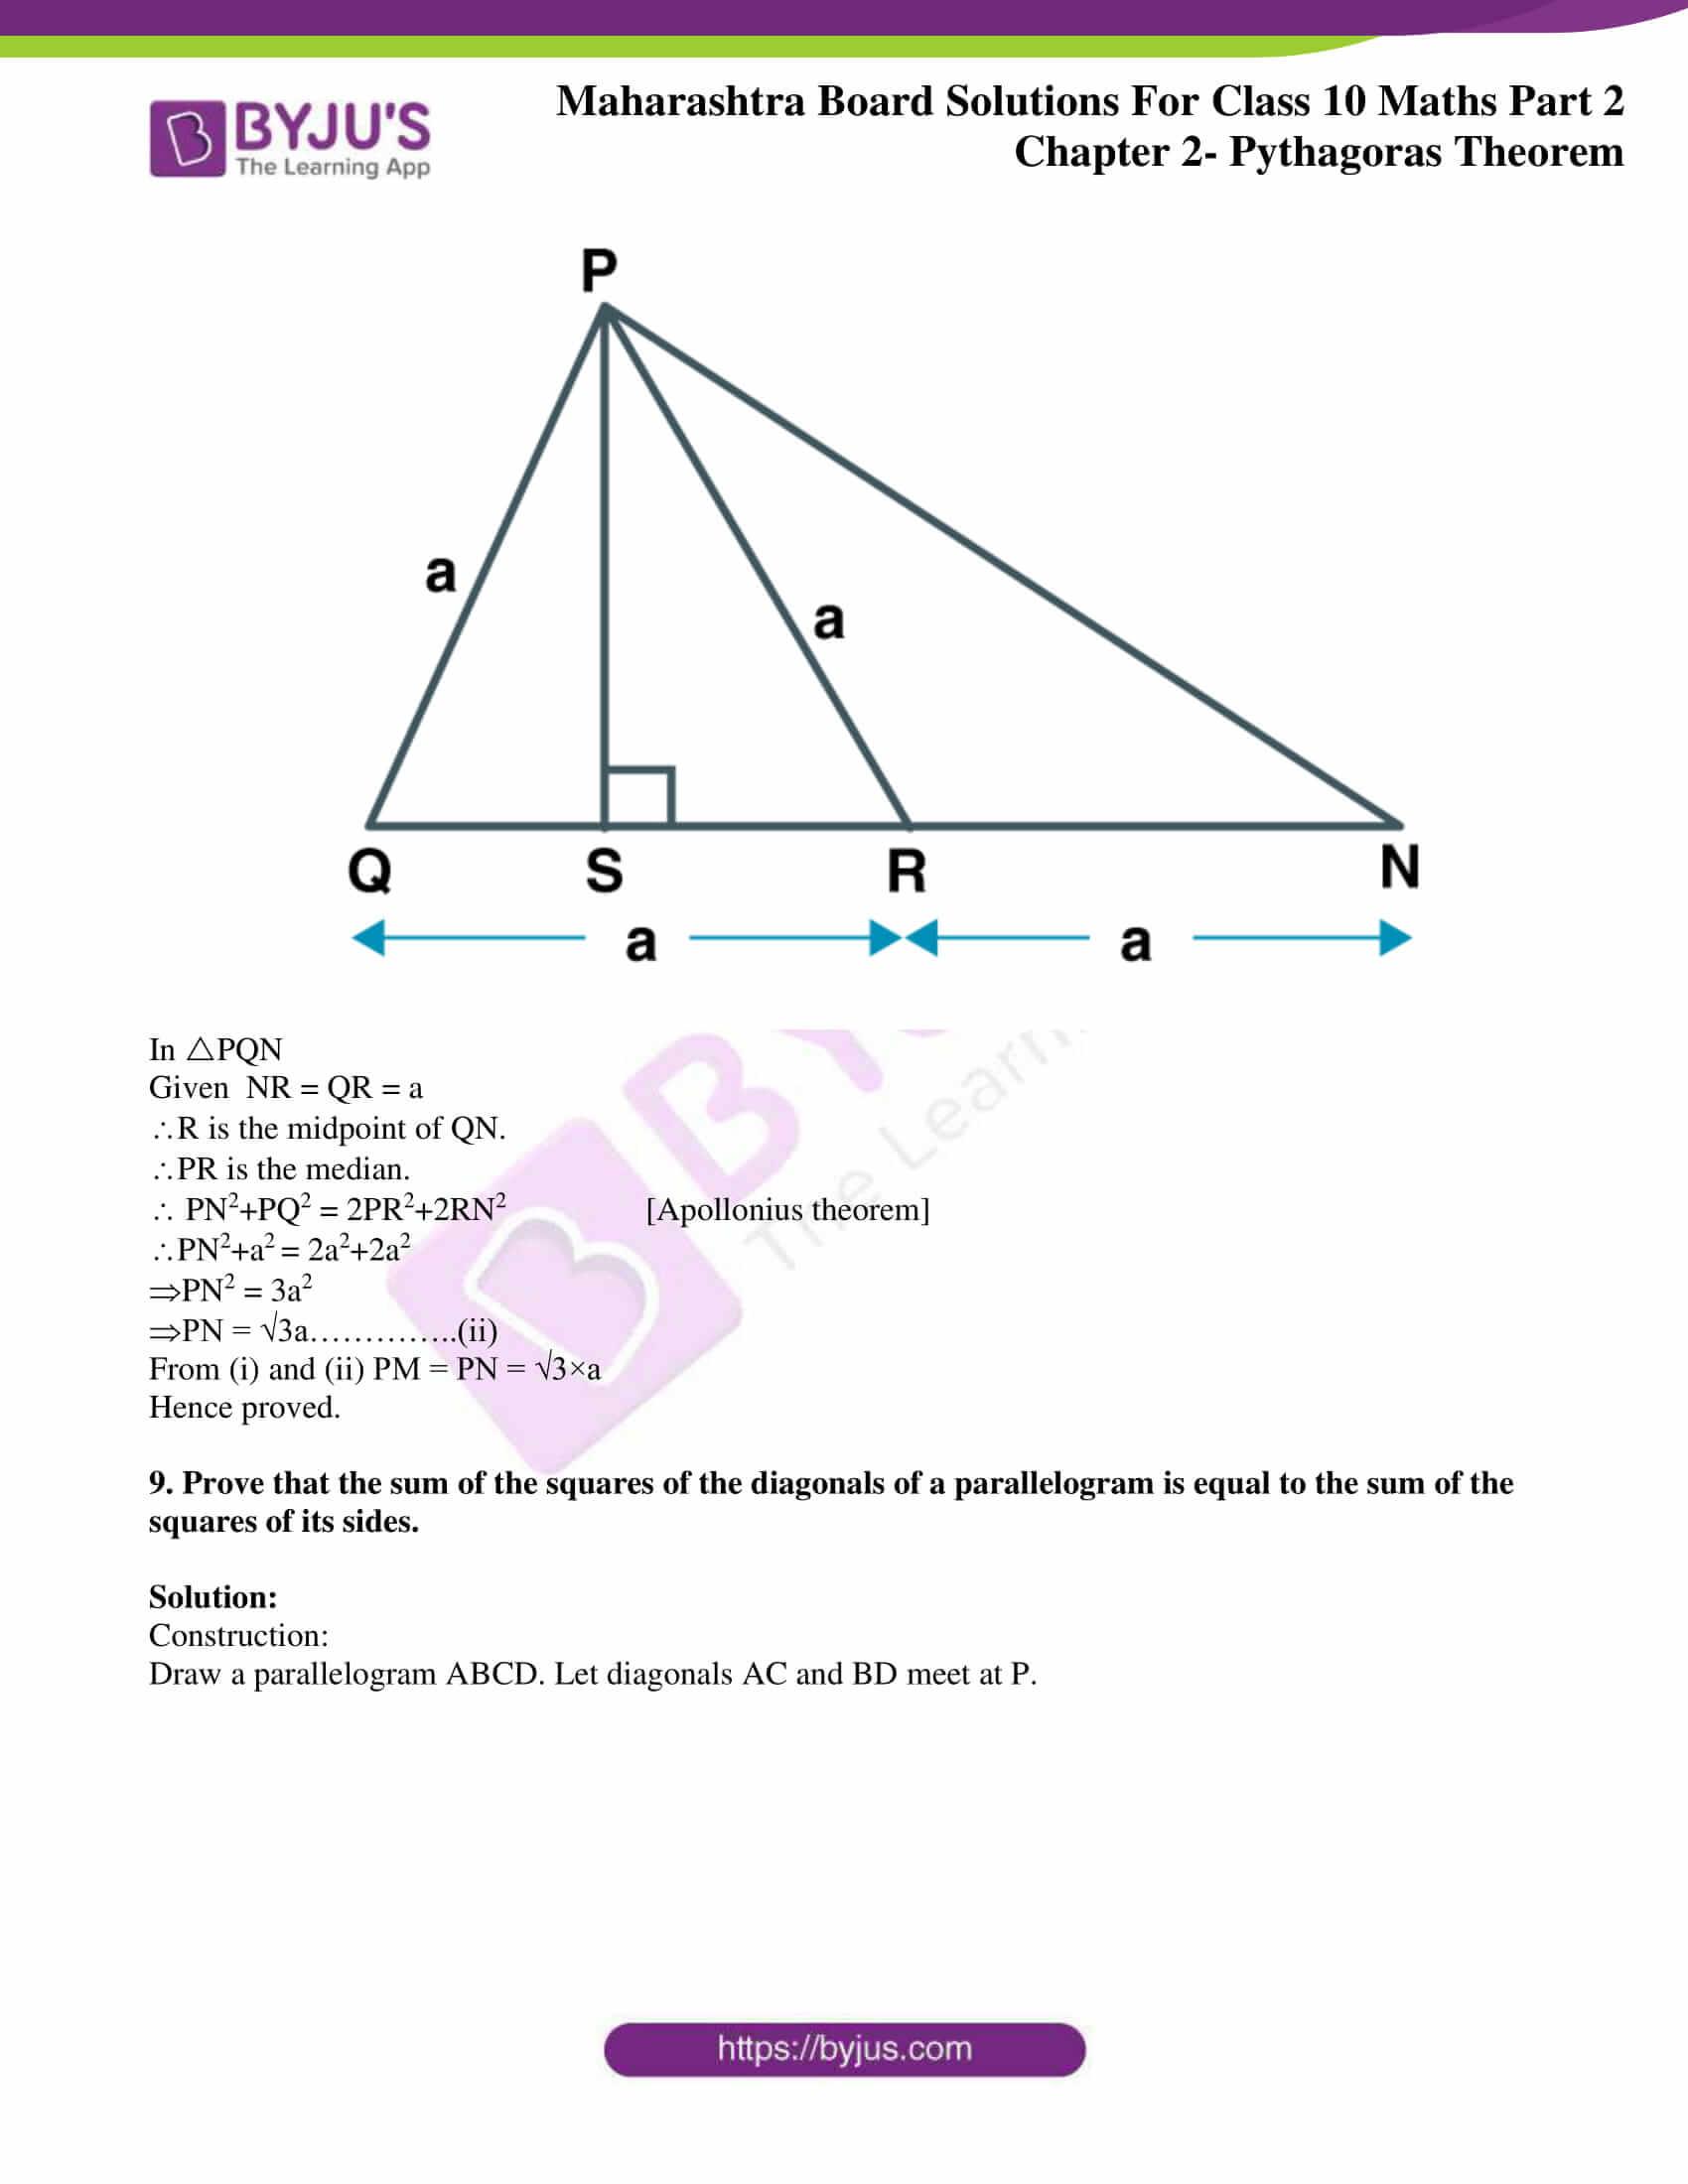 msbshse sol class 10 maths part 2 chapter 2 16